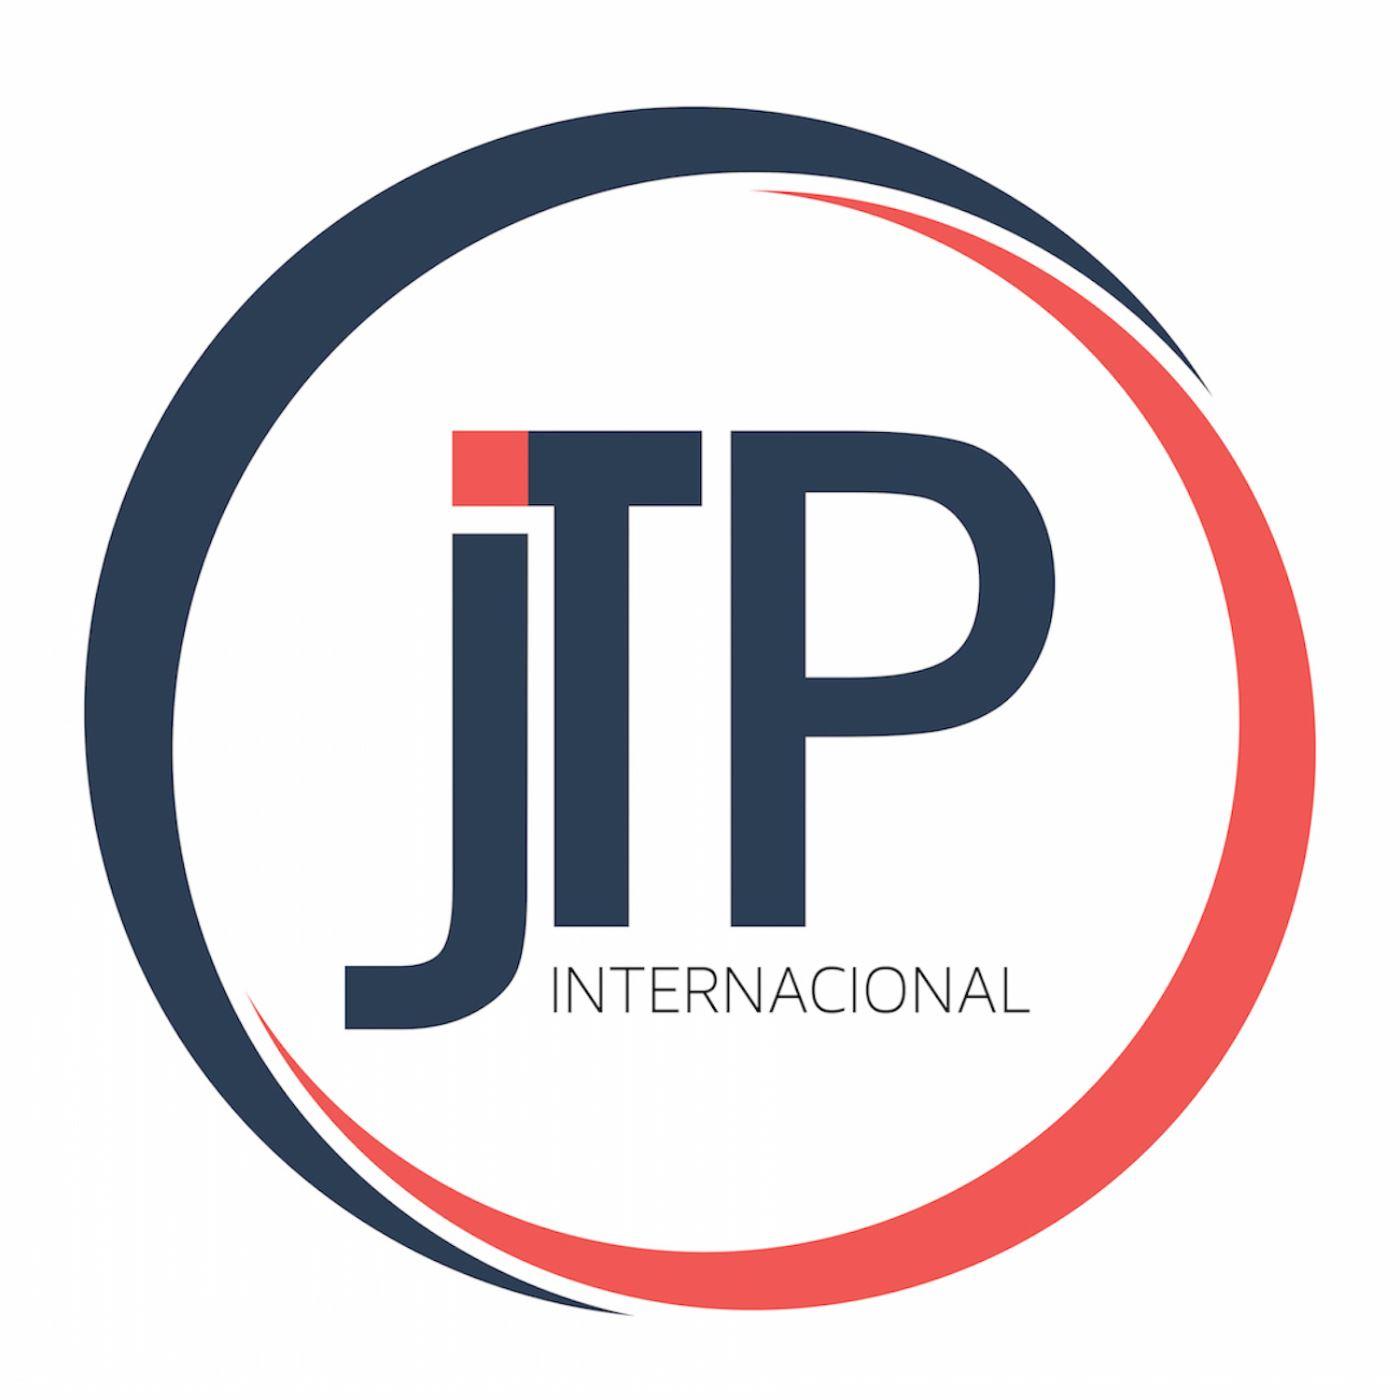 Ministerio JTP